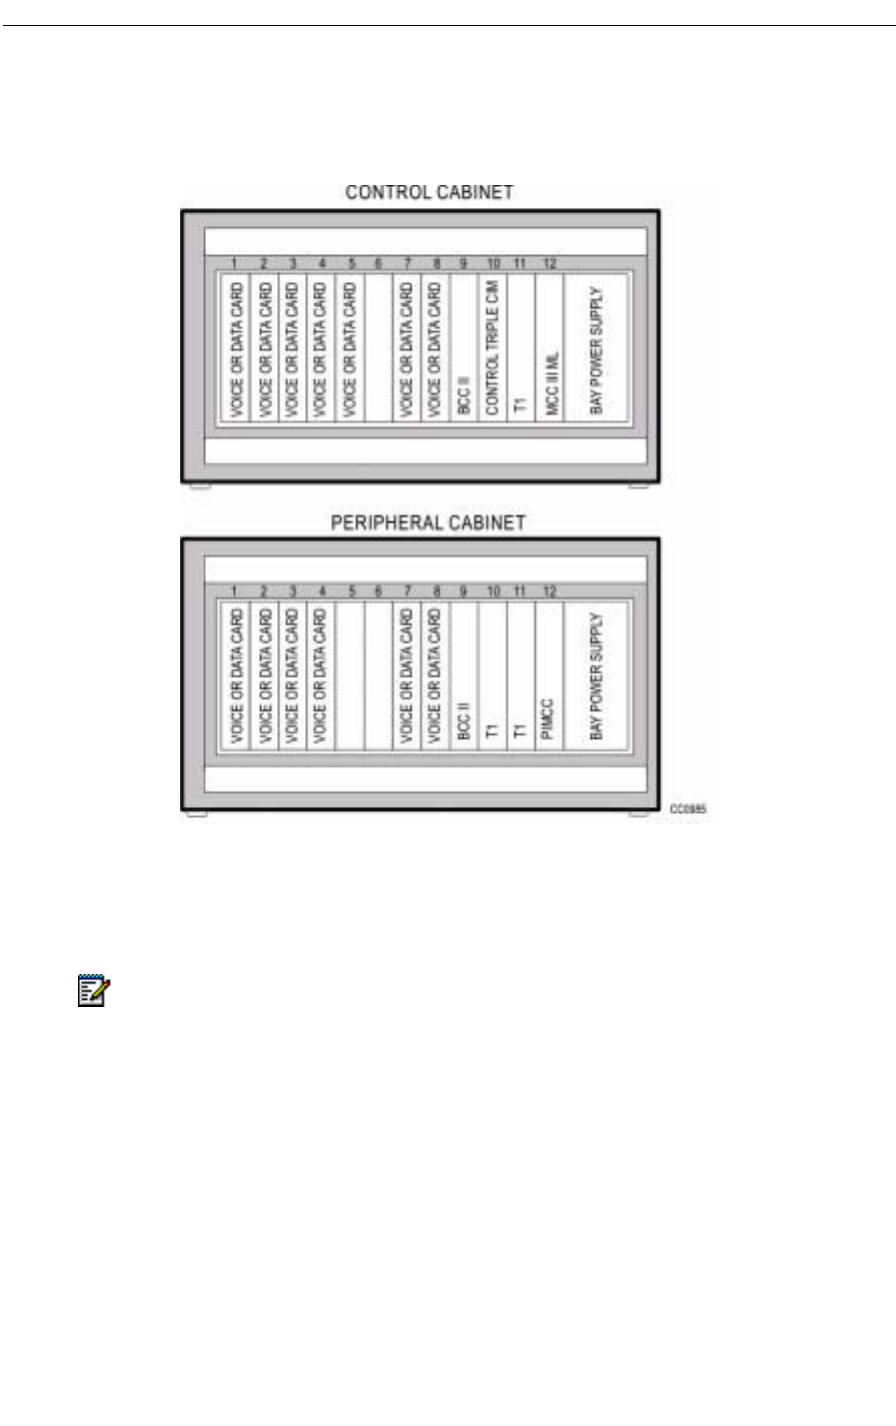 Mitel Sx 500 Manual Wiring Diagram Daihatsu Luxio 5330e Ip Phone 50006476 Certified Refurbished Array Rh Elzplorers De